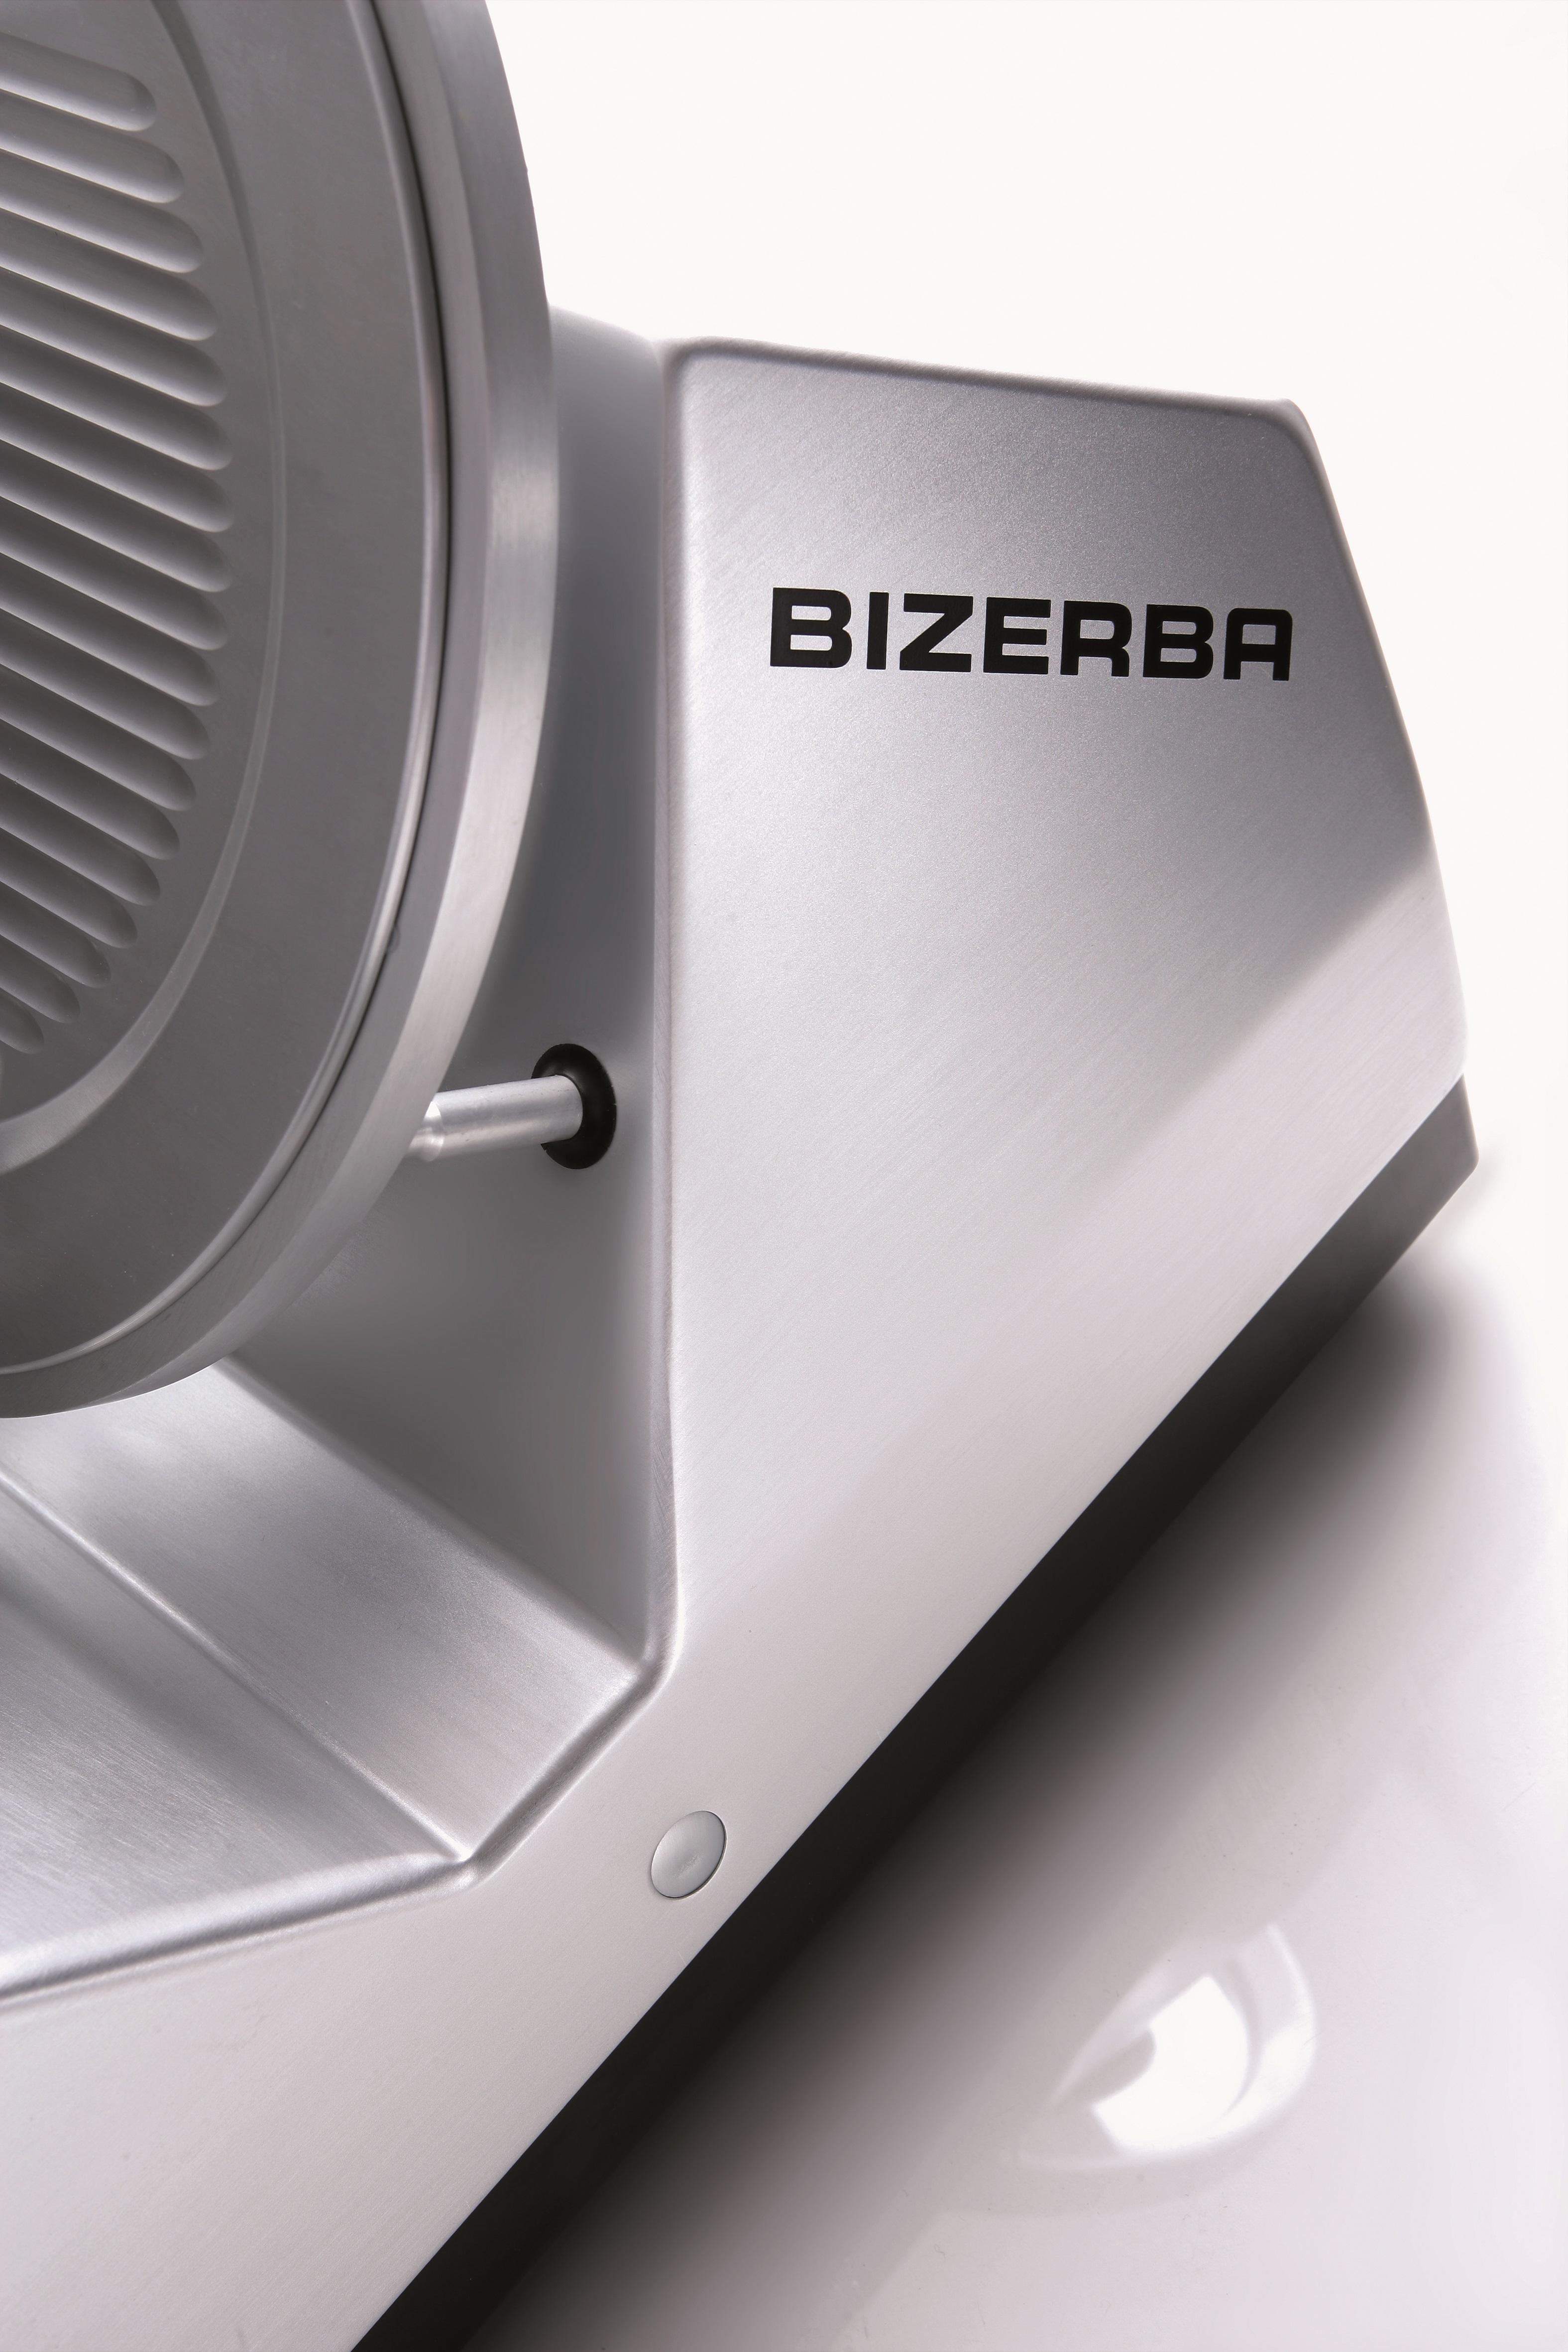 Bizerba Topics